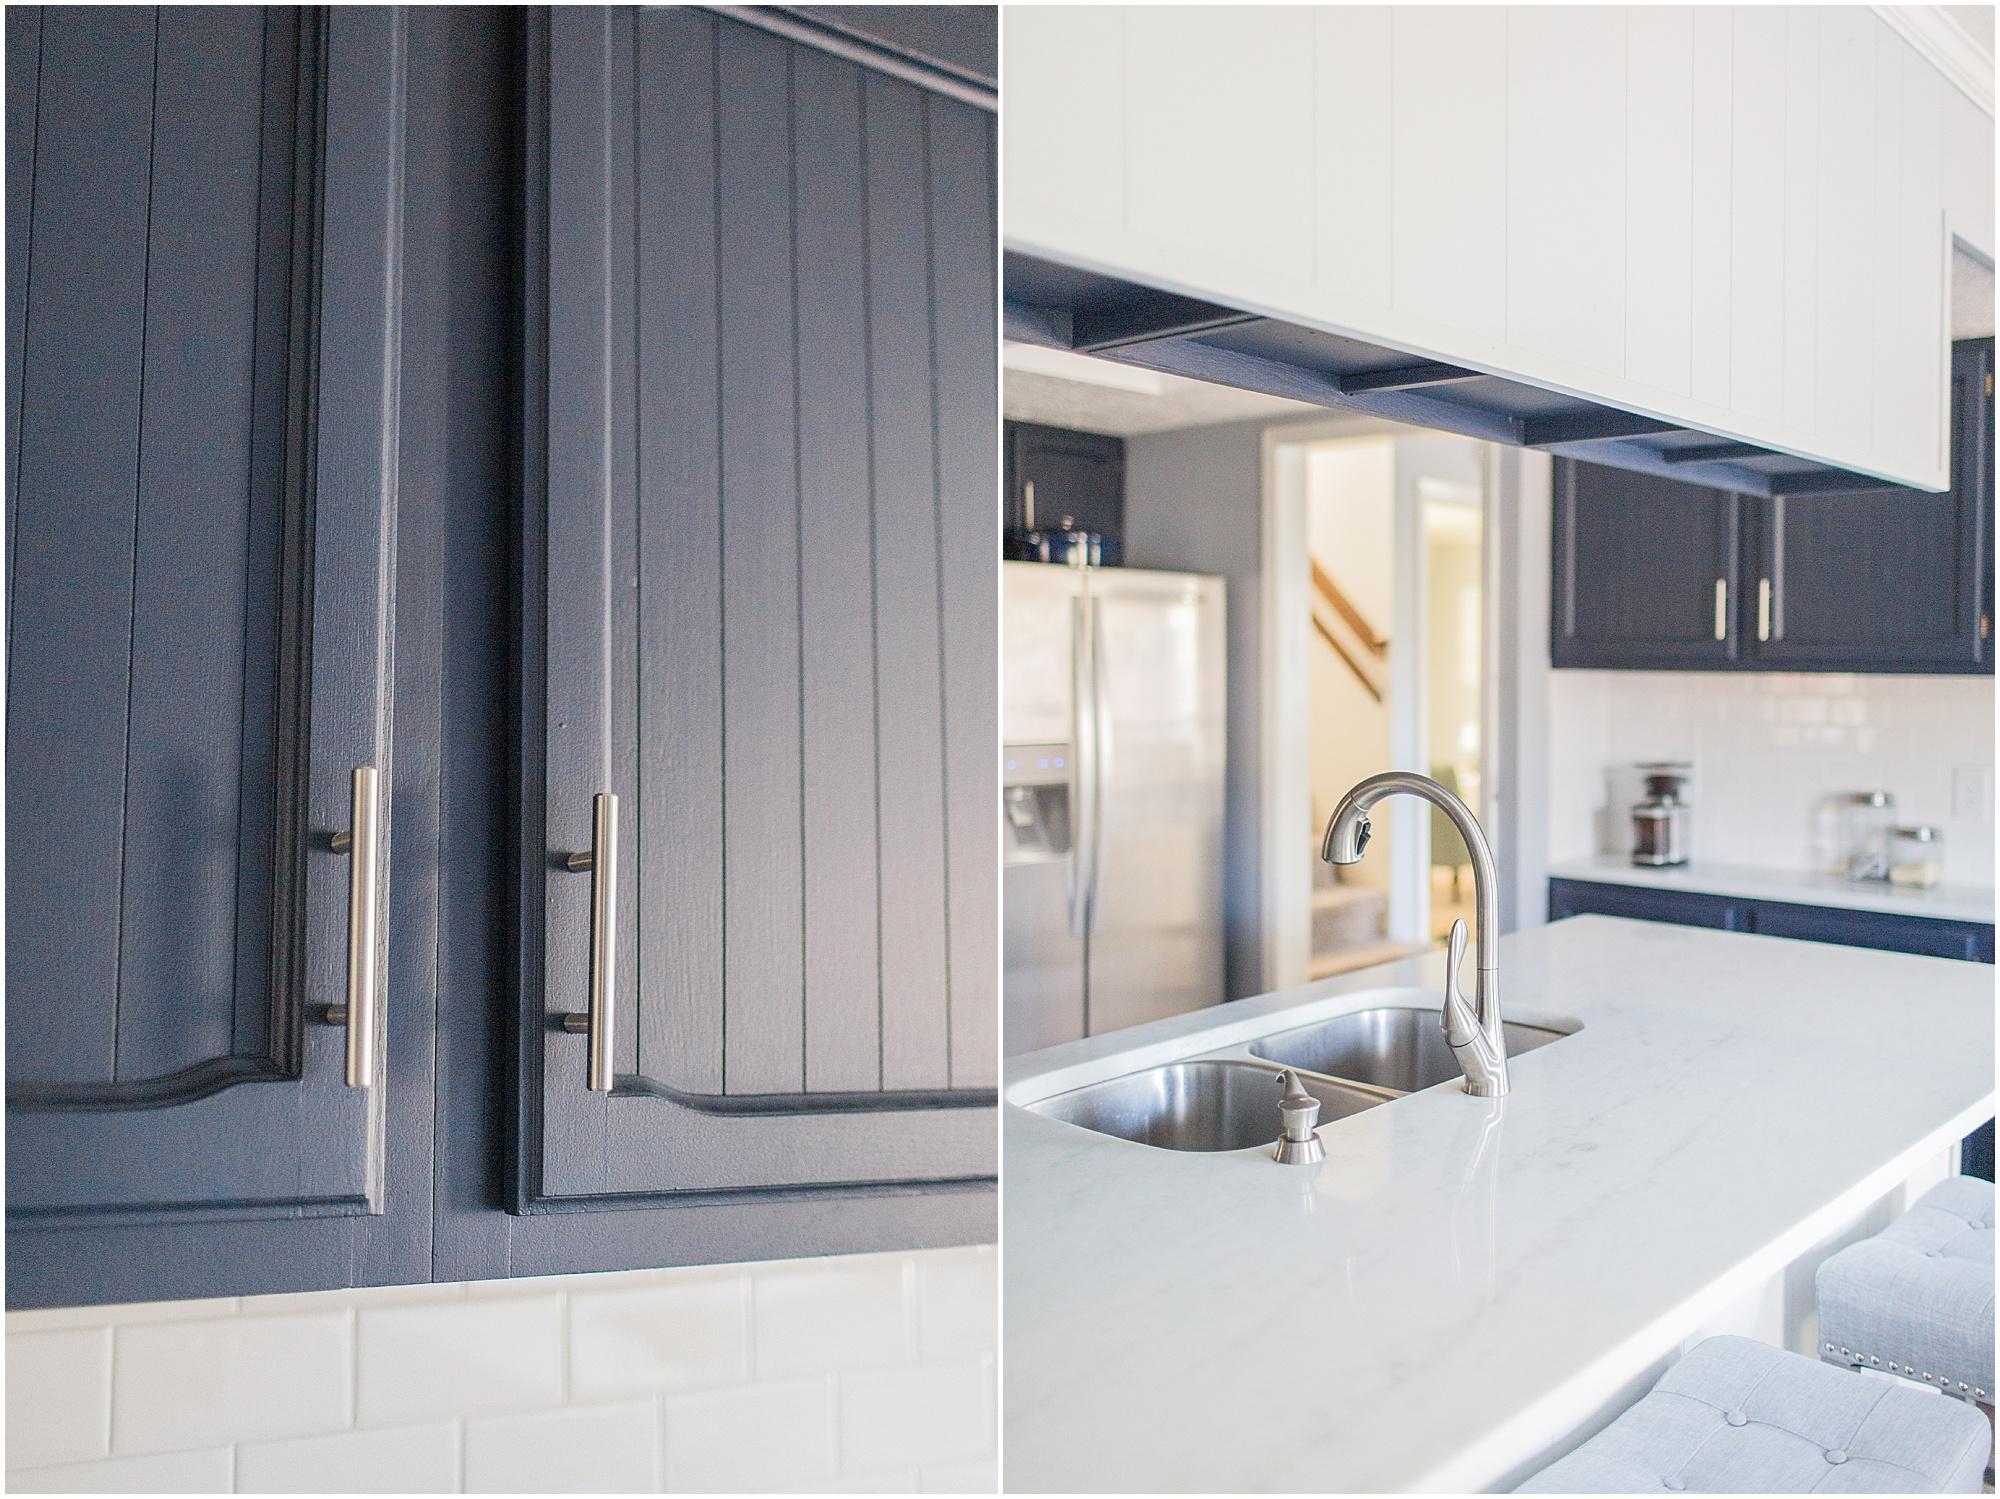 hambick-house-kitchen-renovation-fixer-upper_0027.jpg